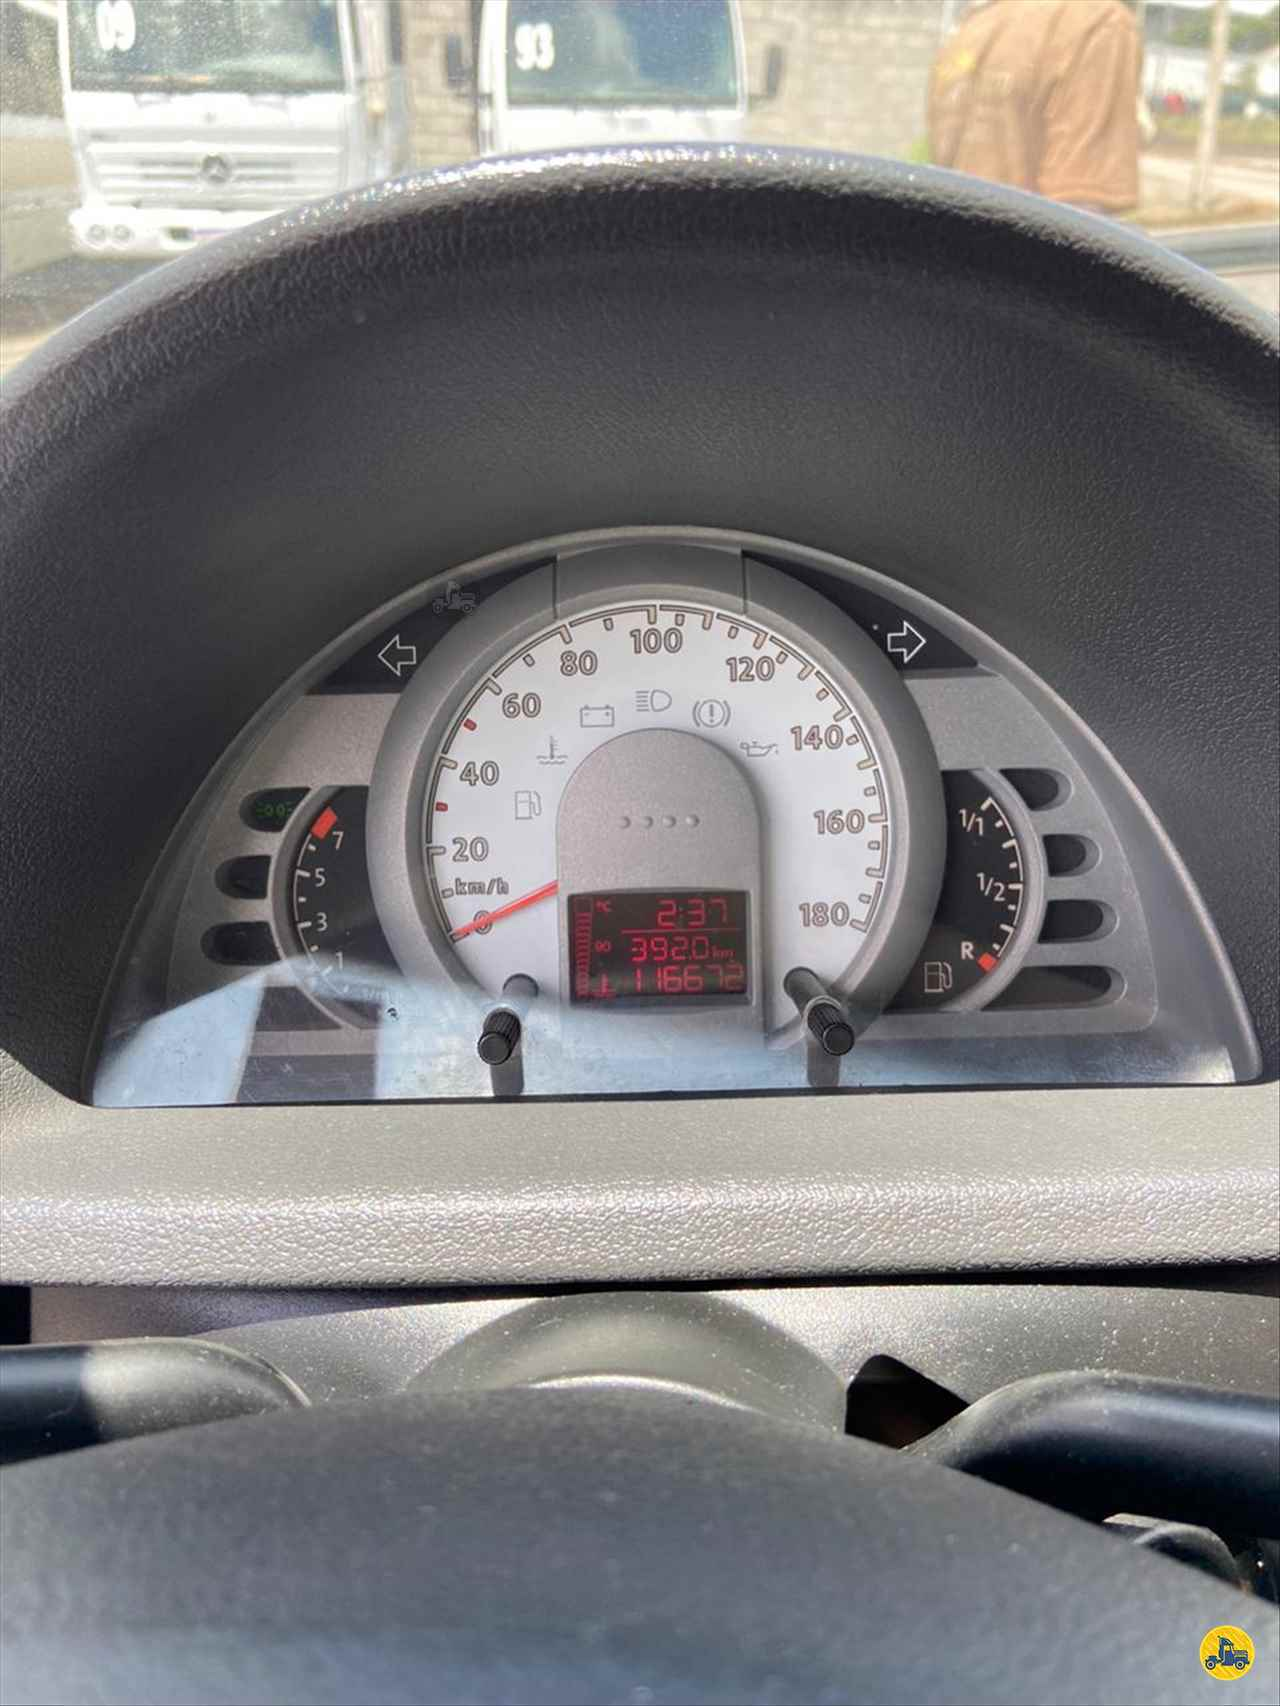 VW - Volkswagen Gol 1.0 Trend 116000km 2008/2009 Gegê Caminhões